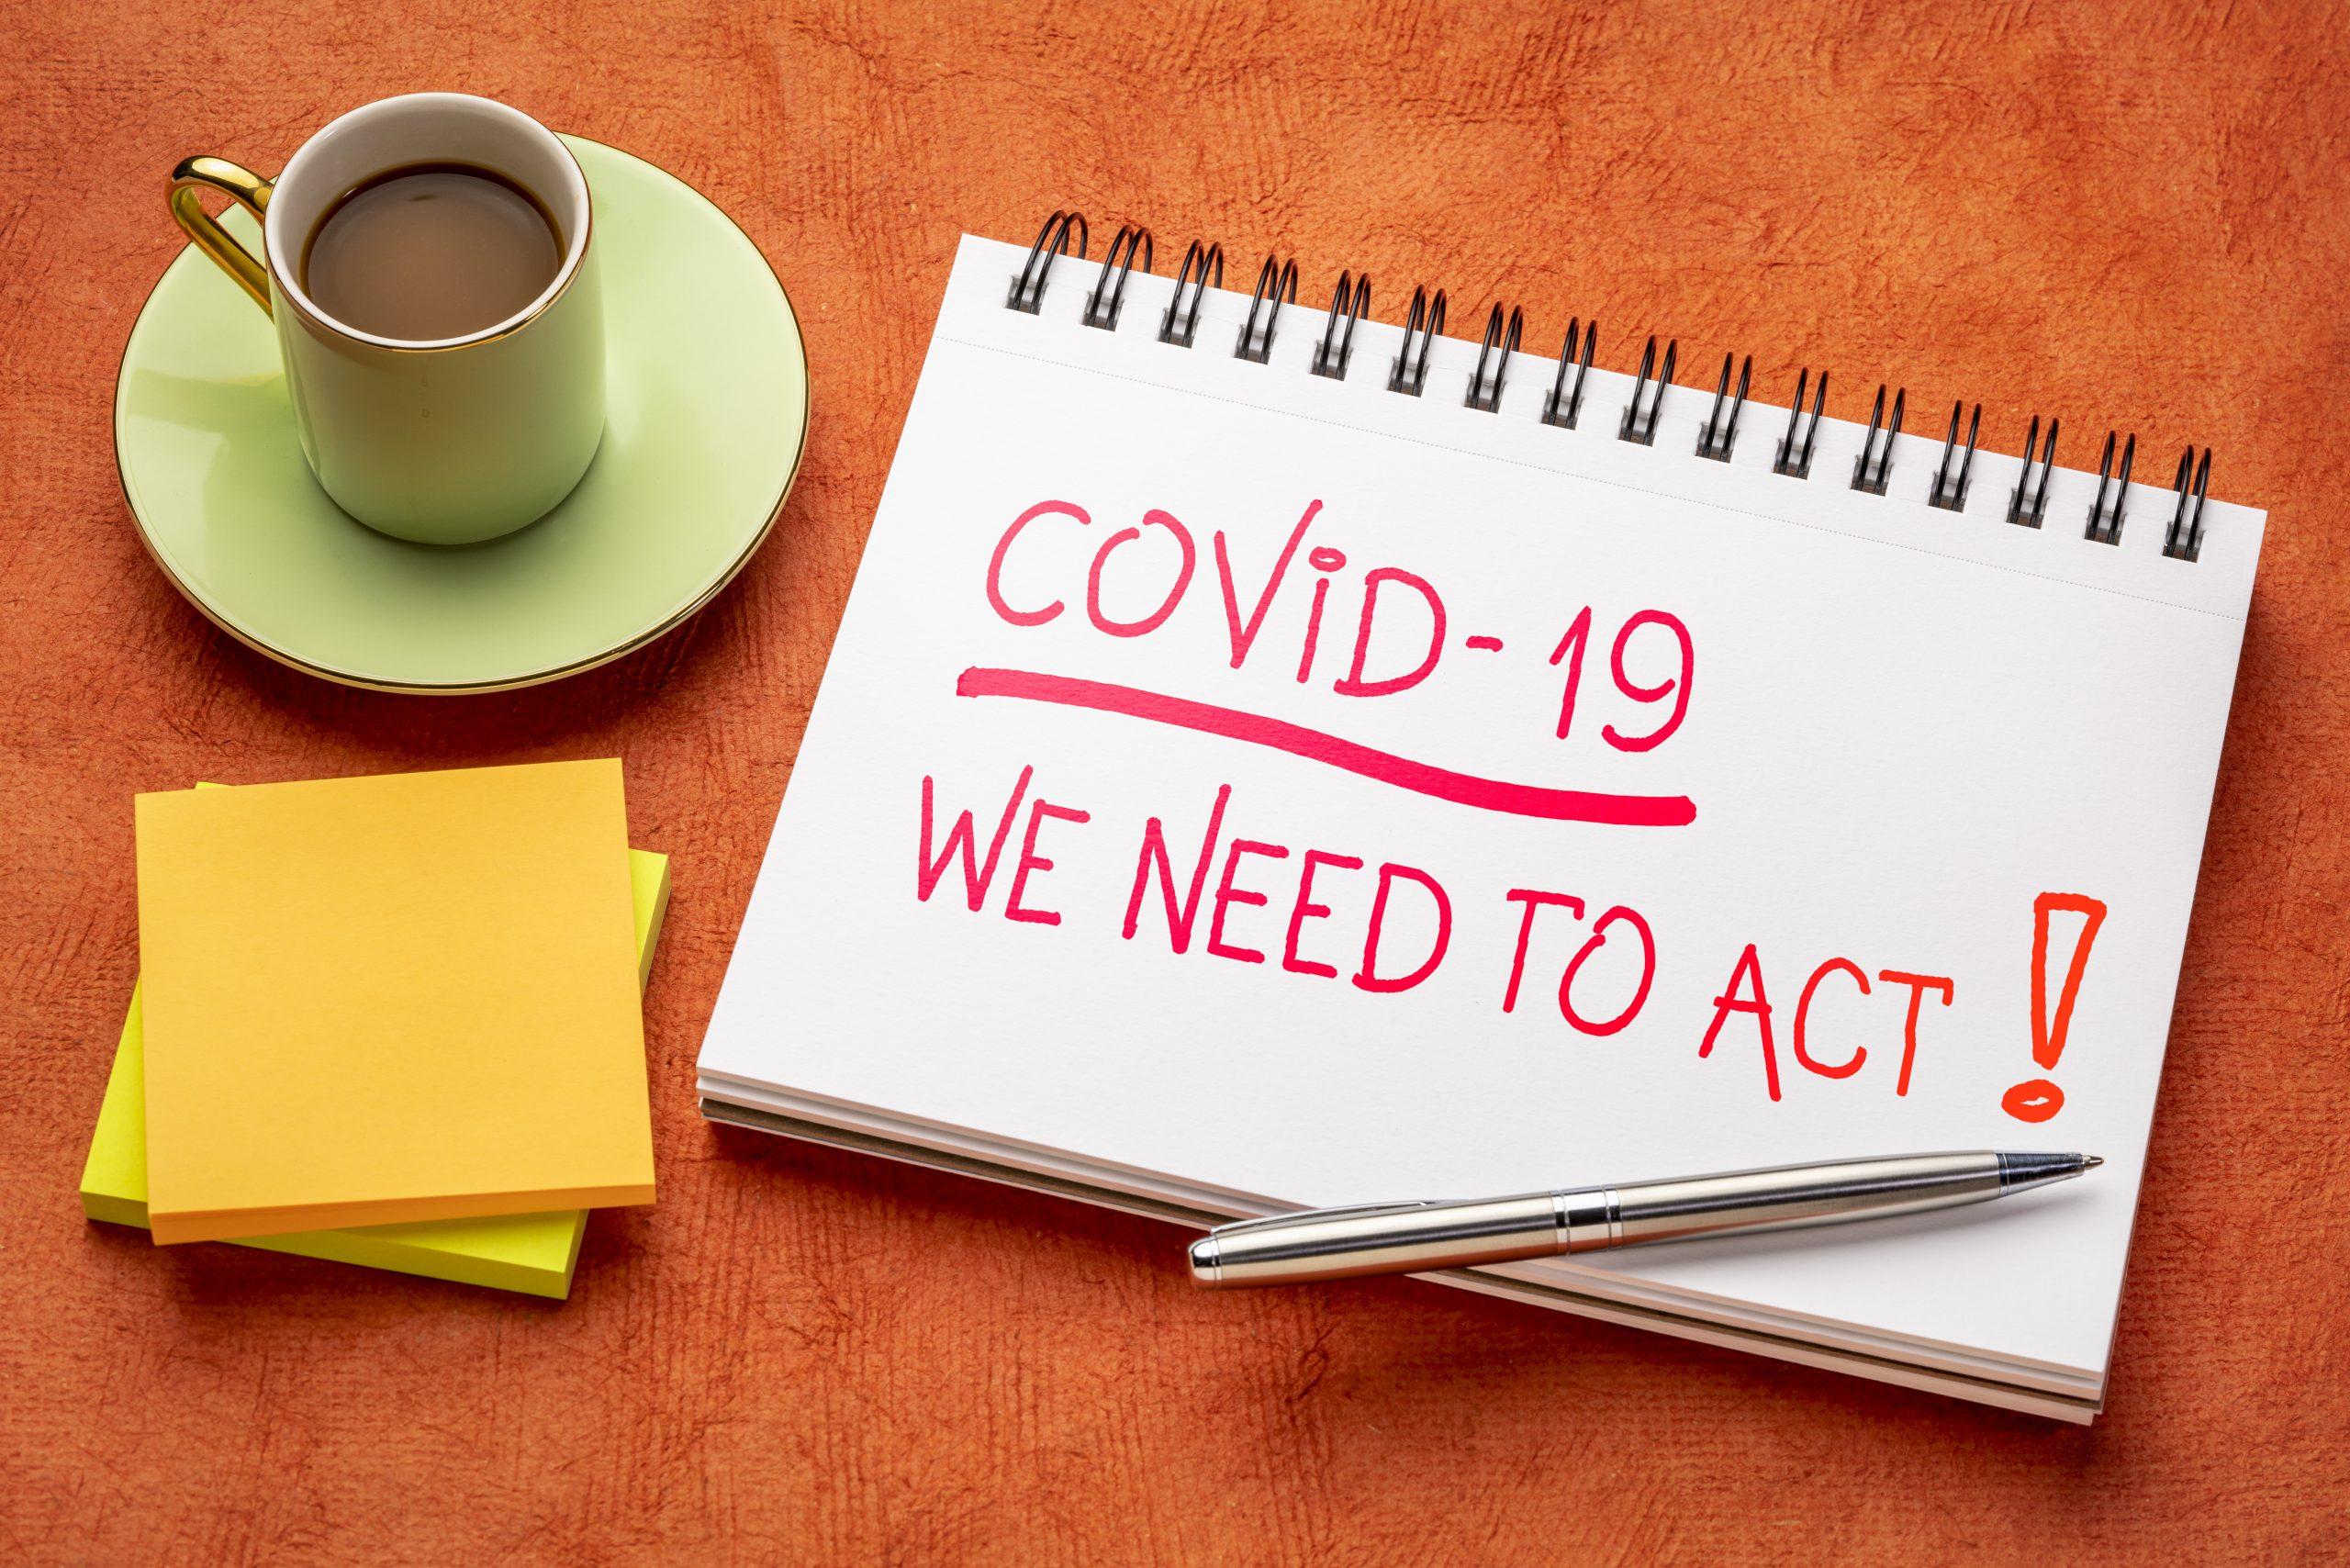 Autism Community COVID-19 Response Fund Announcement